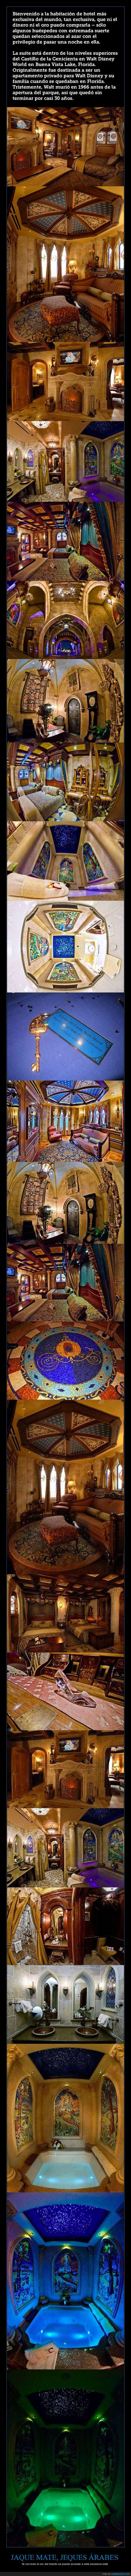 castillo,disney,disneyworld,suite